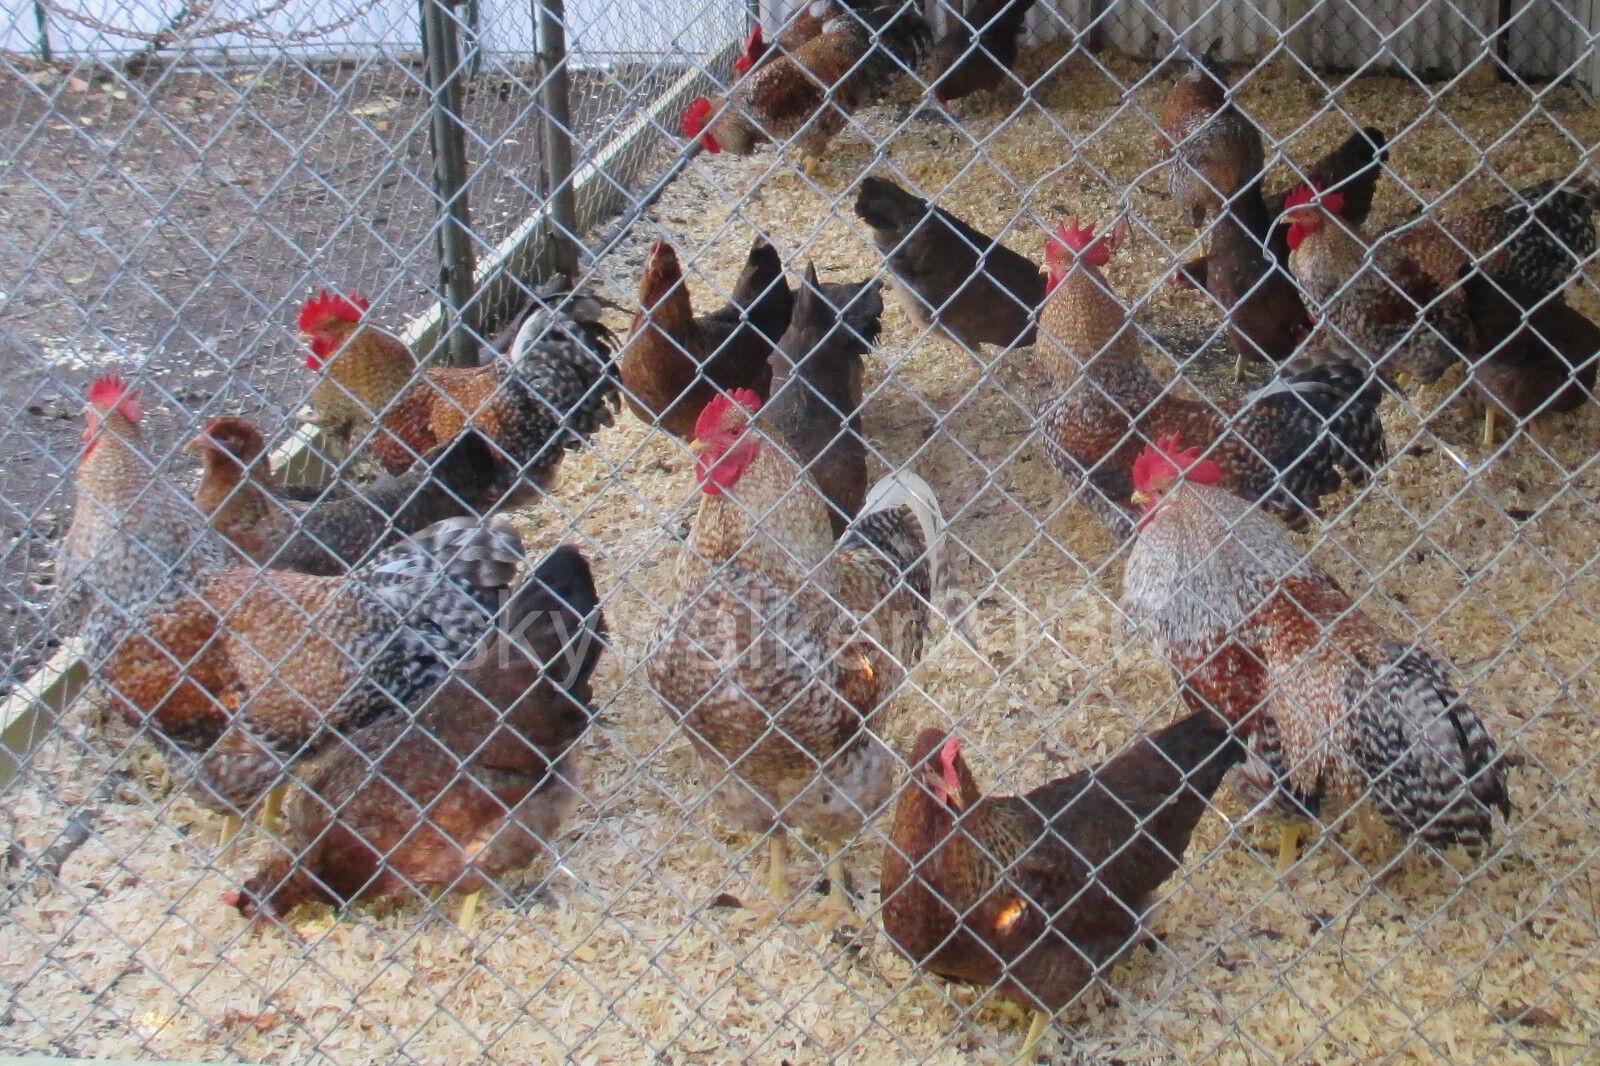 10 Bielefelder Fertile Hatching Eggs. Flock Is From 2011 13 Import Bloodline - $9.99